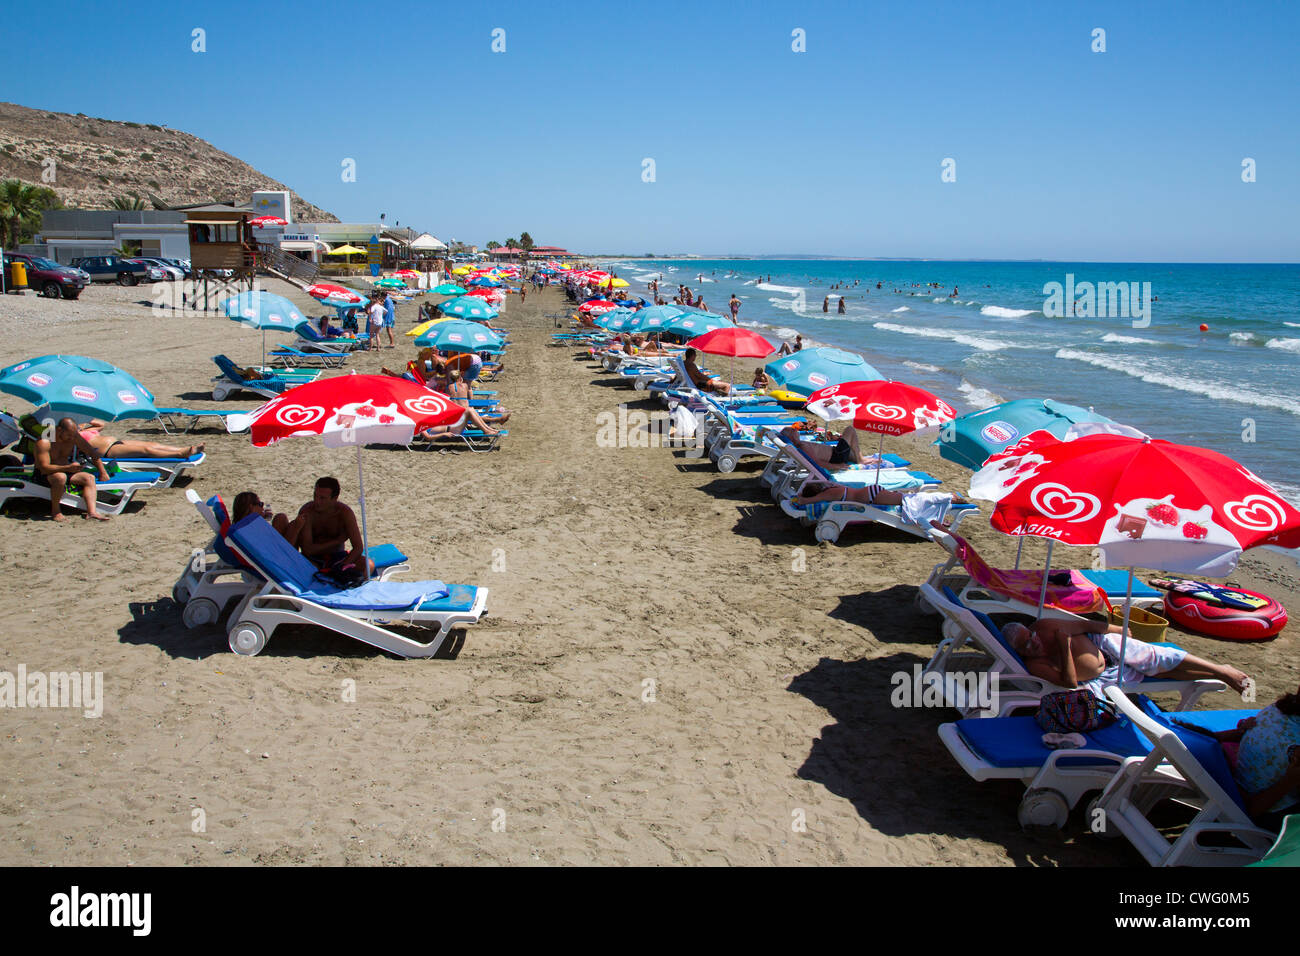 Episkopi Beach near the British Services Base of SBA Akrotiri is popular with British families based tin Cyprus. - Stock Image